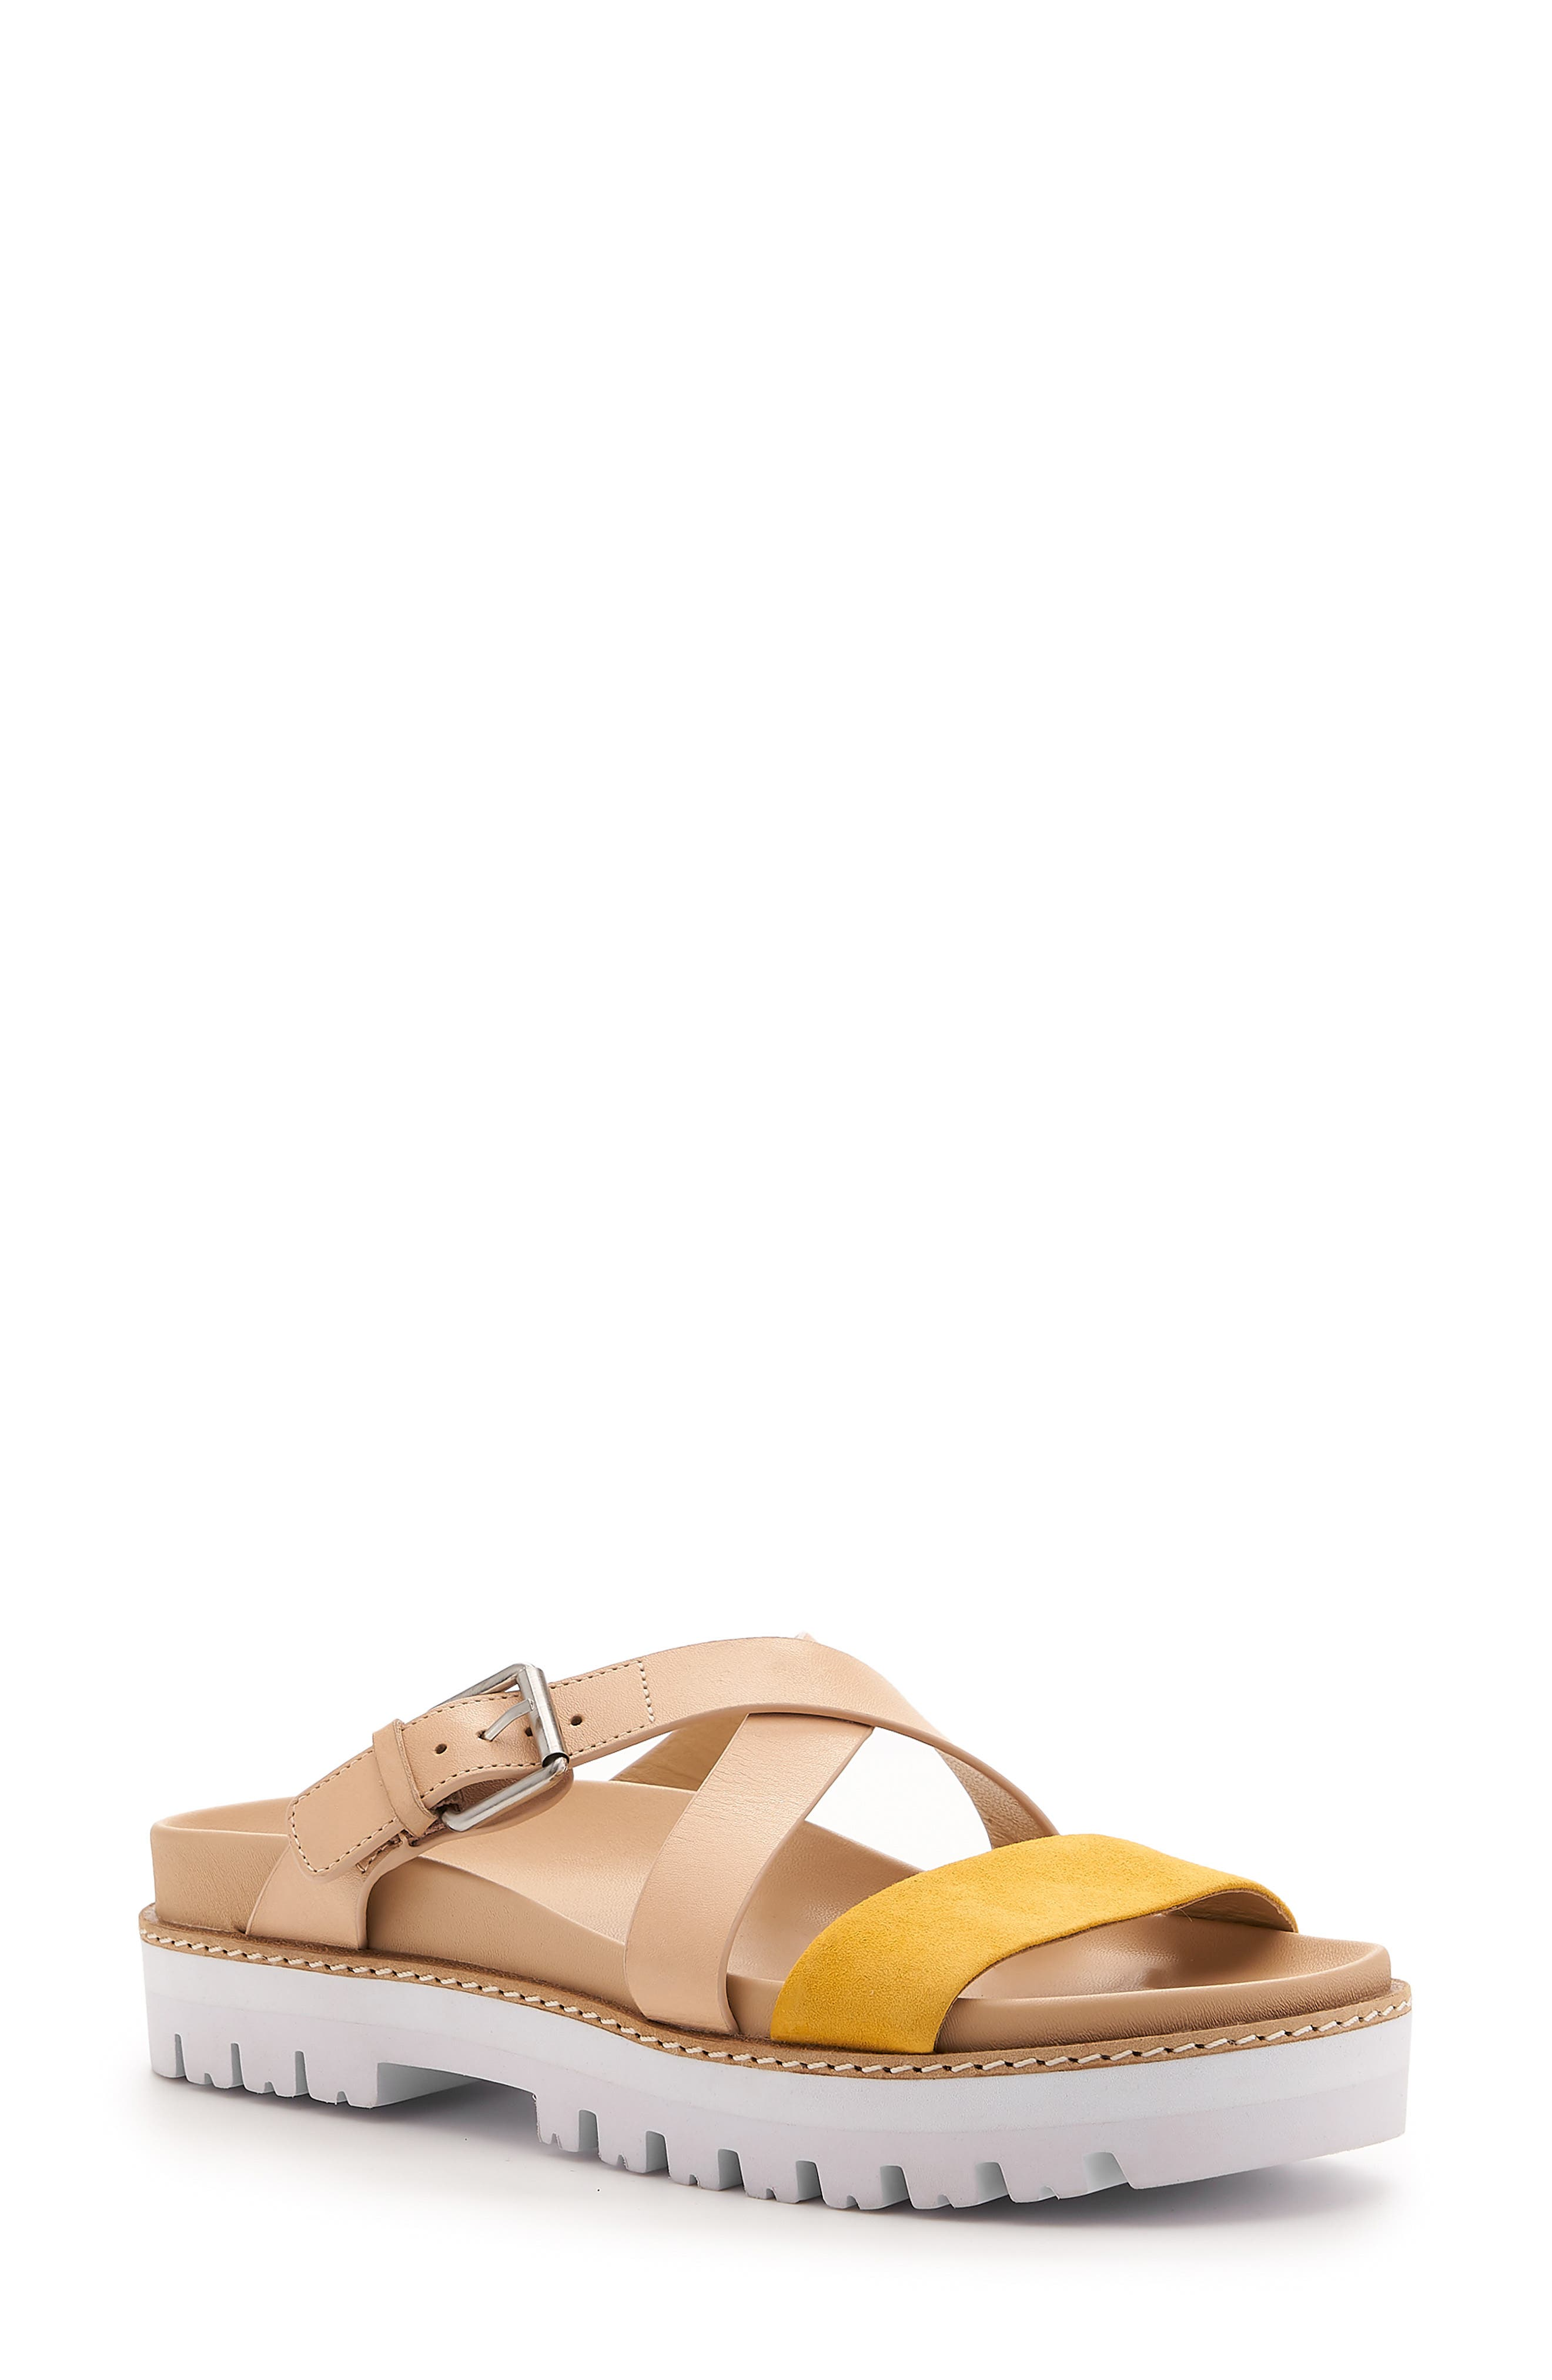 Botkier Jupiter Platform Slide Sandal, Yellow